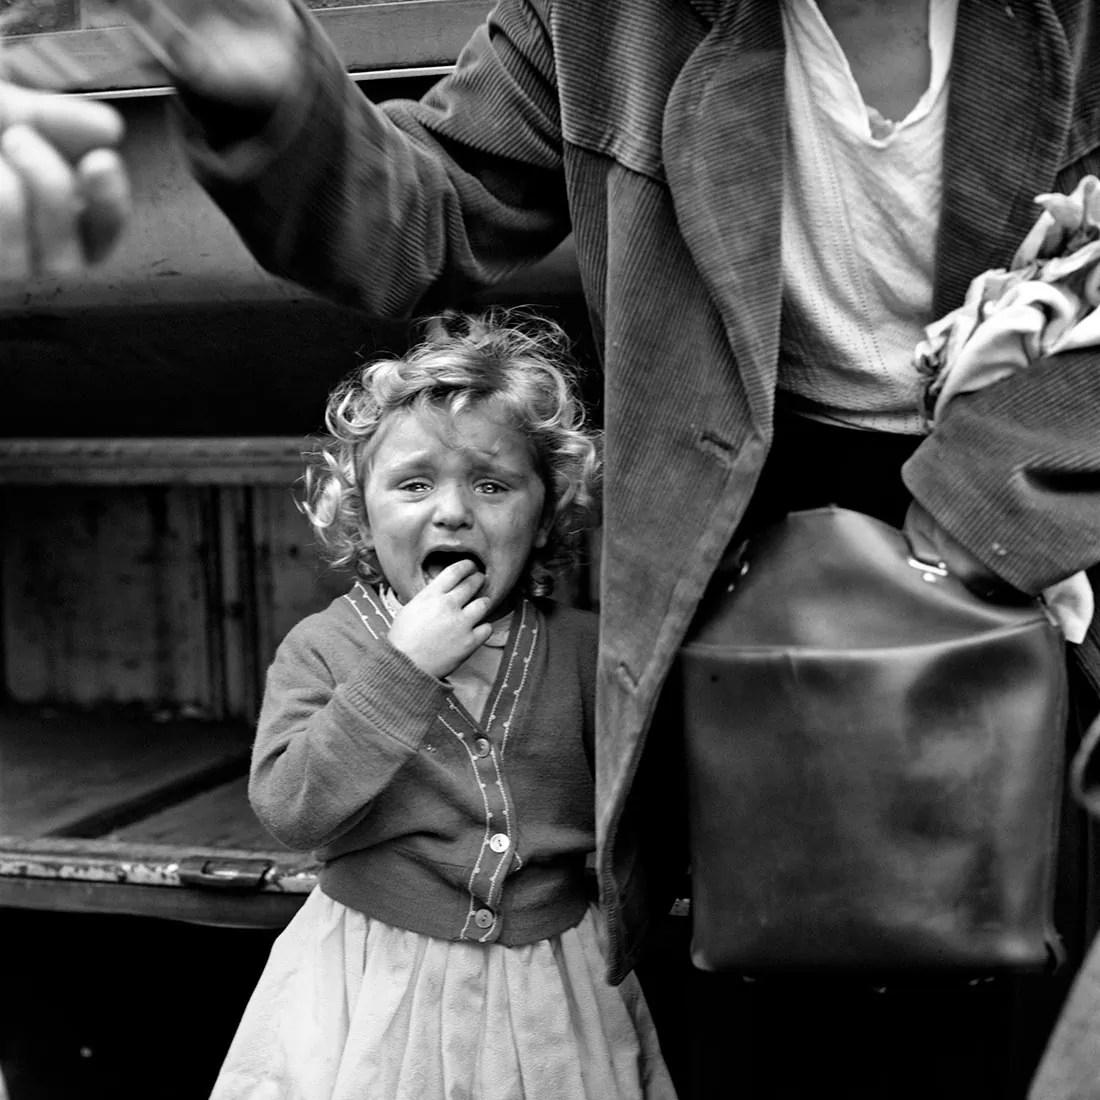 VM19XXW03452 16 MC - Una storia Meravigliosa: Vivian Maier (Street Photography) - fotostreet.it